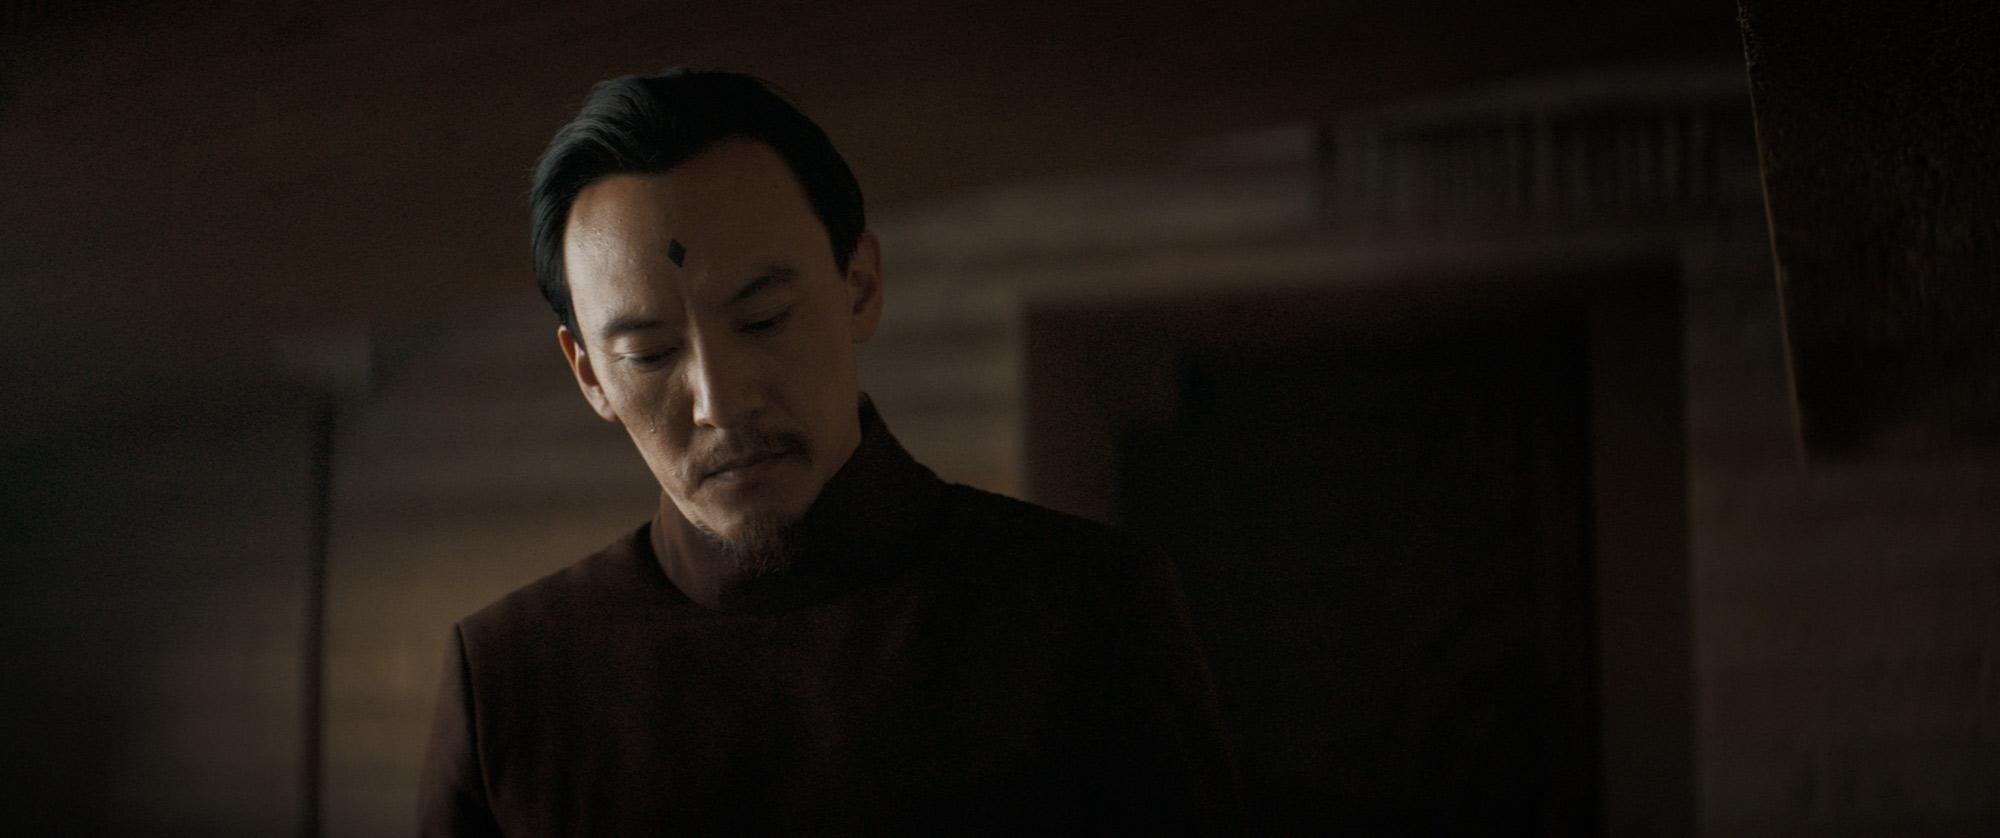 Wellington Yueh/2021 film